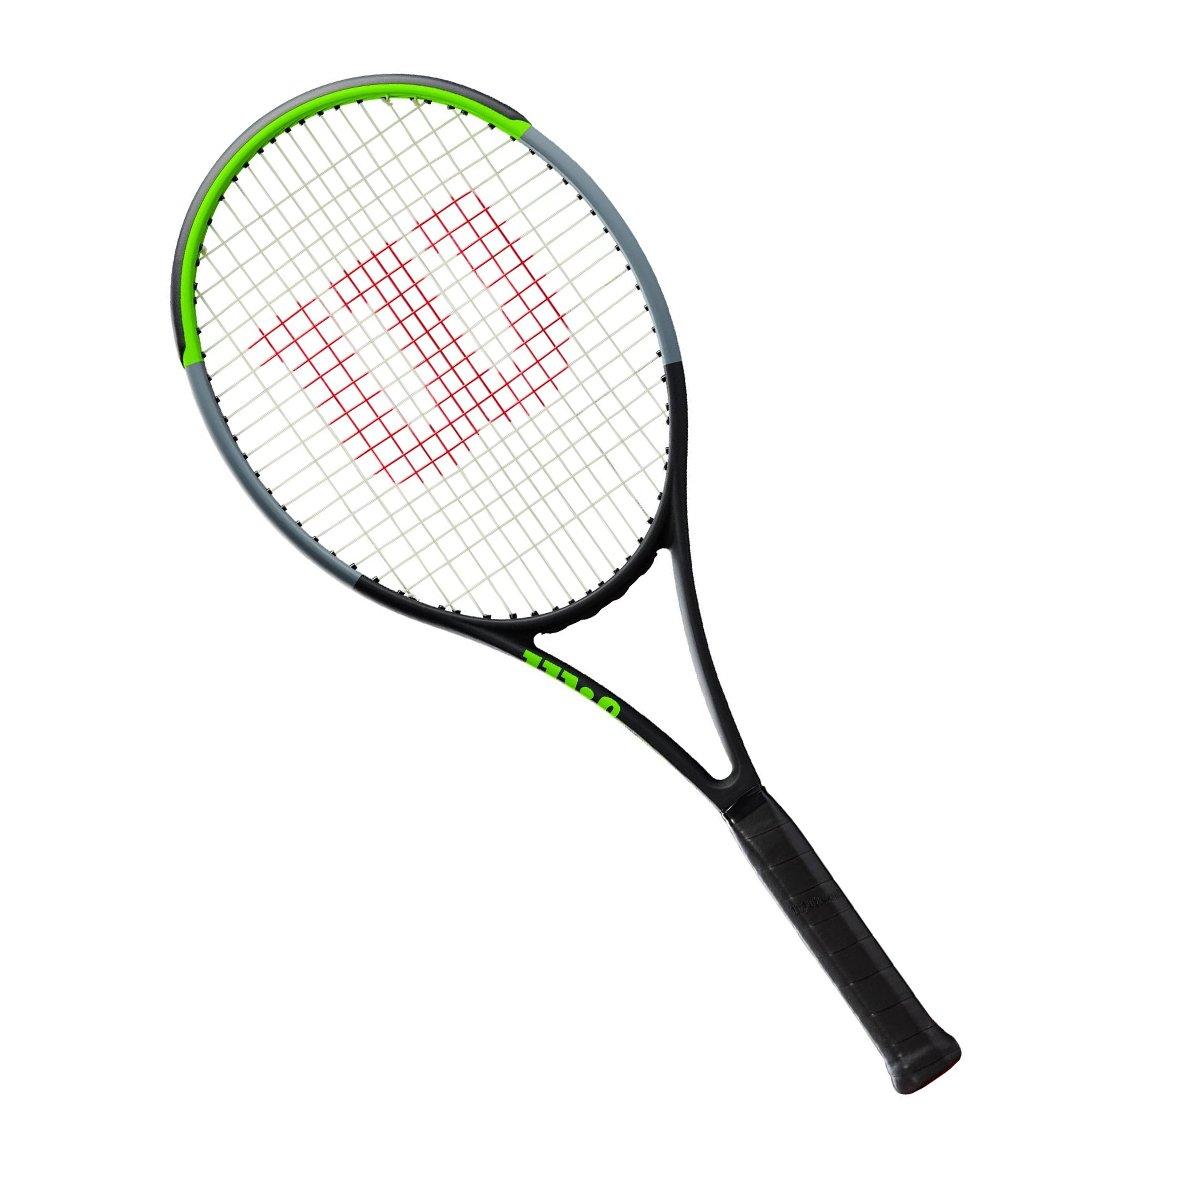 Raquete de Tenis Wilson Blade 100L V7